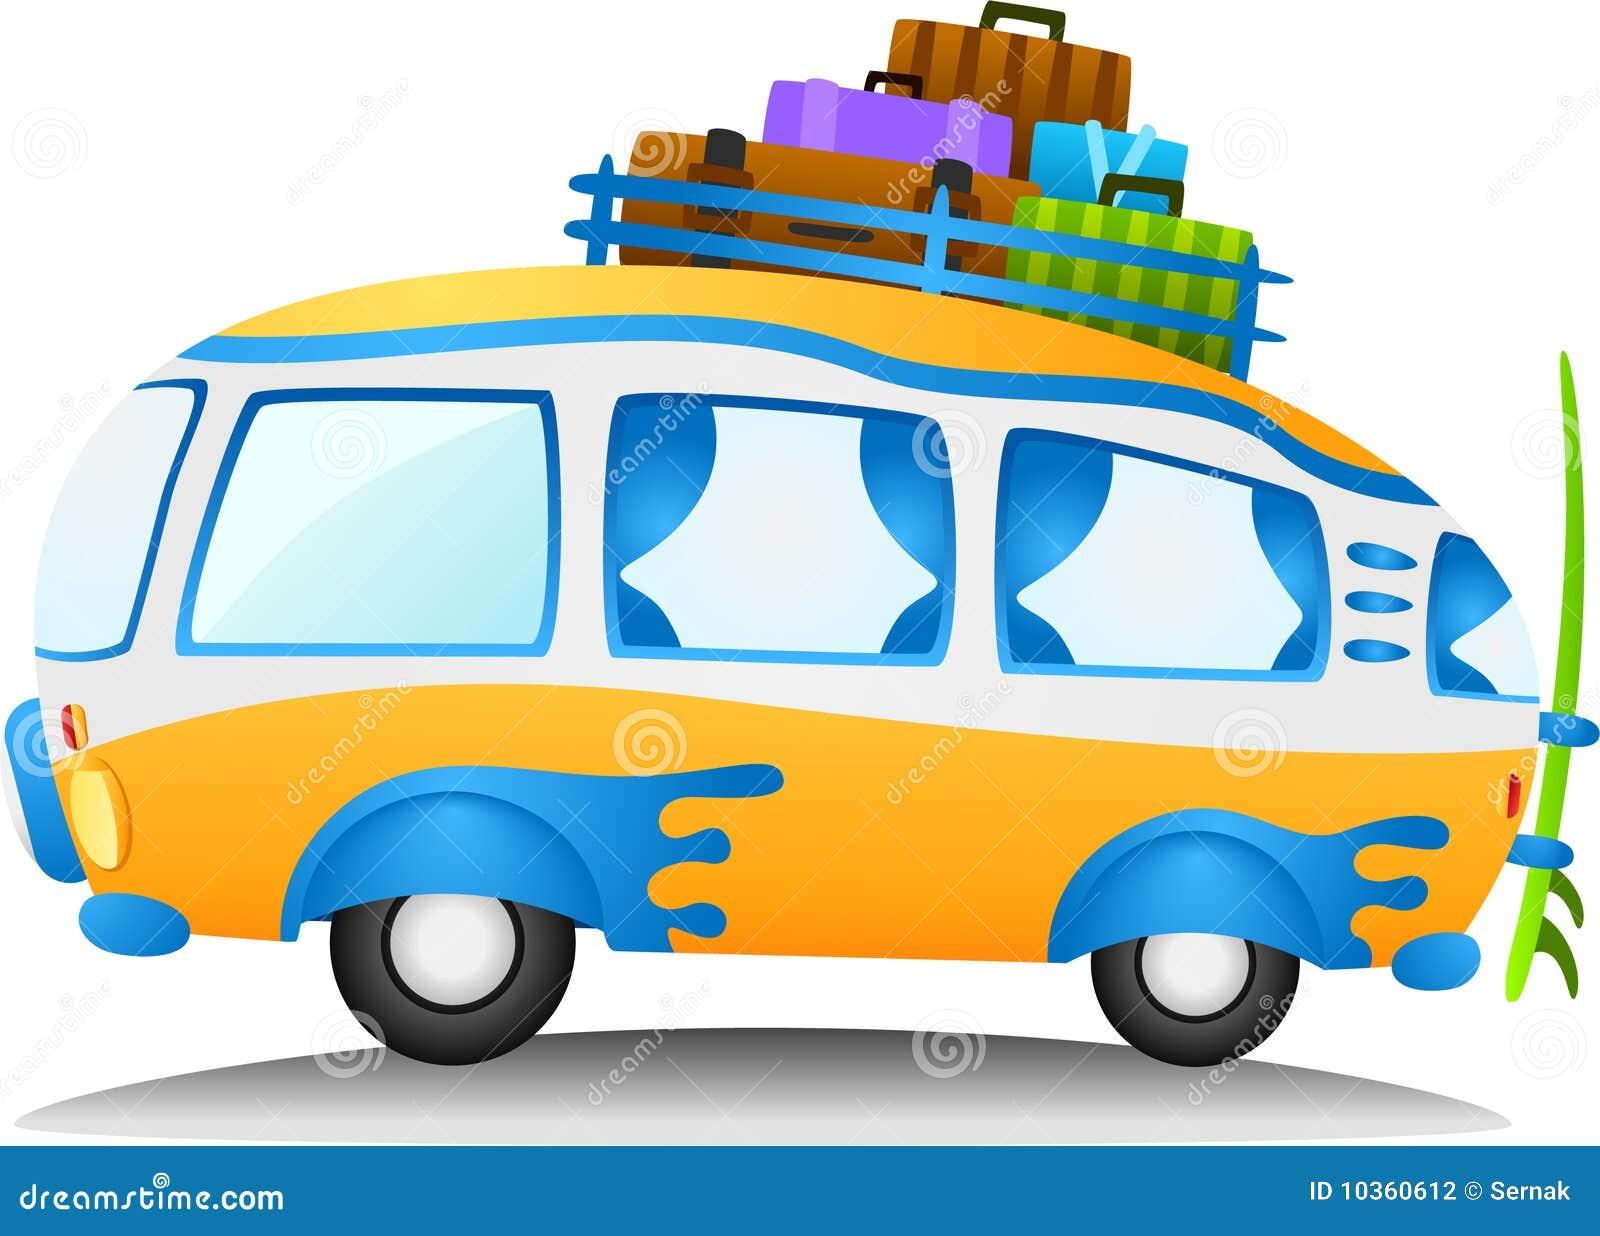 Cartoon Travel Van Stock Vector Illustration Of Retro